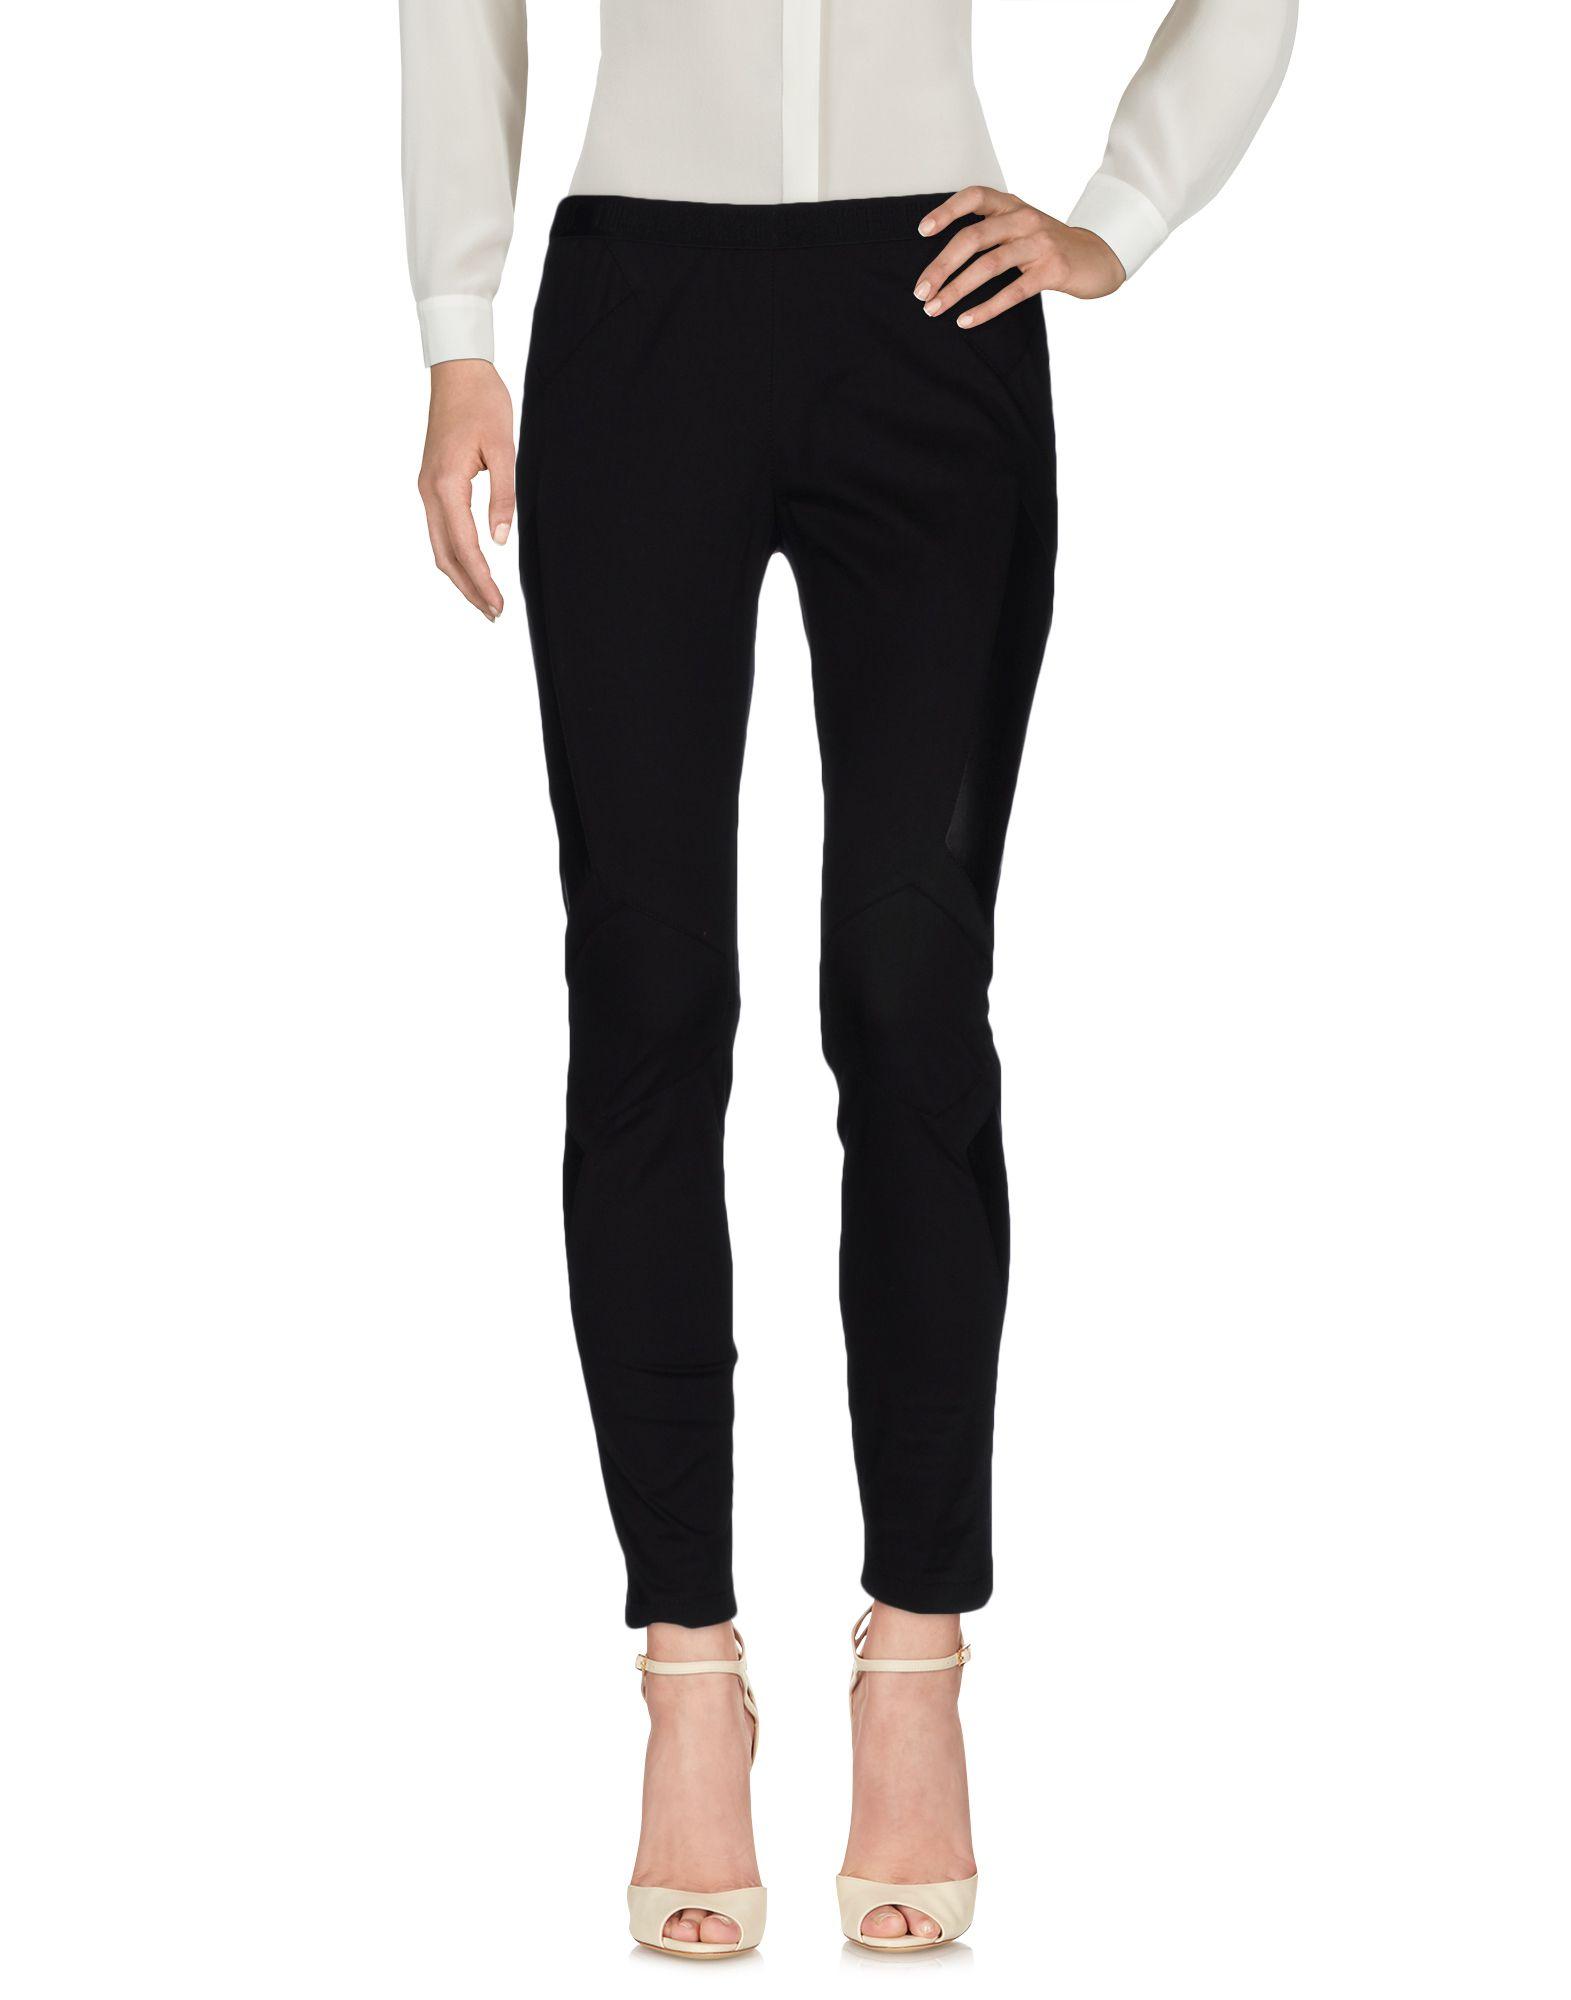 DIRK BIKKEMBERGS SPORT COUTURE Повседневные брюки джинсы dirk bikkembergs джинсы зауженные